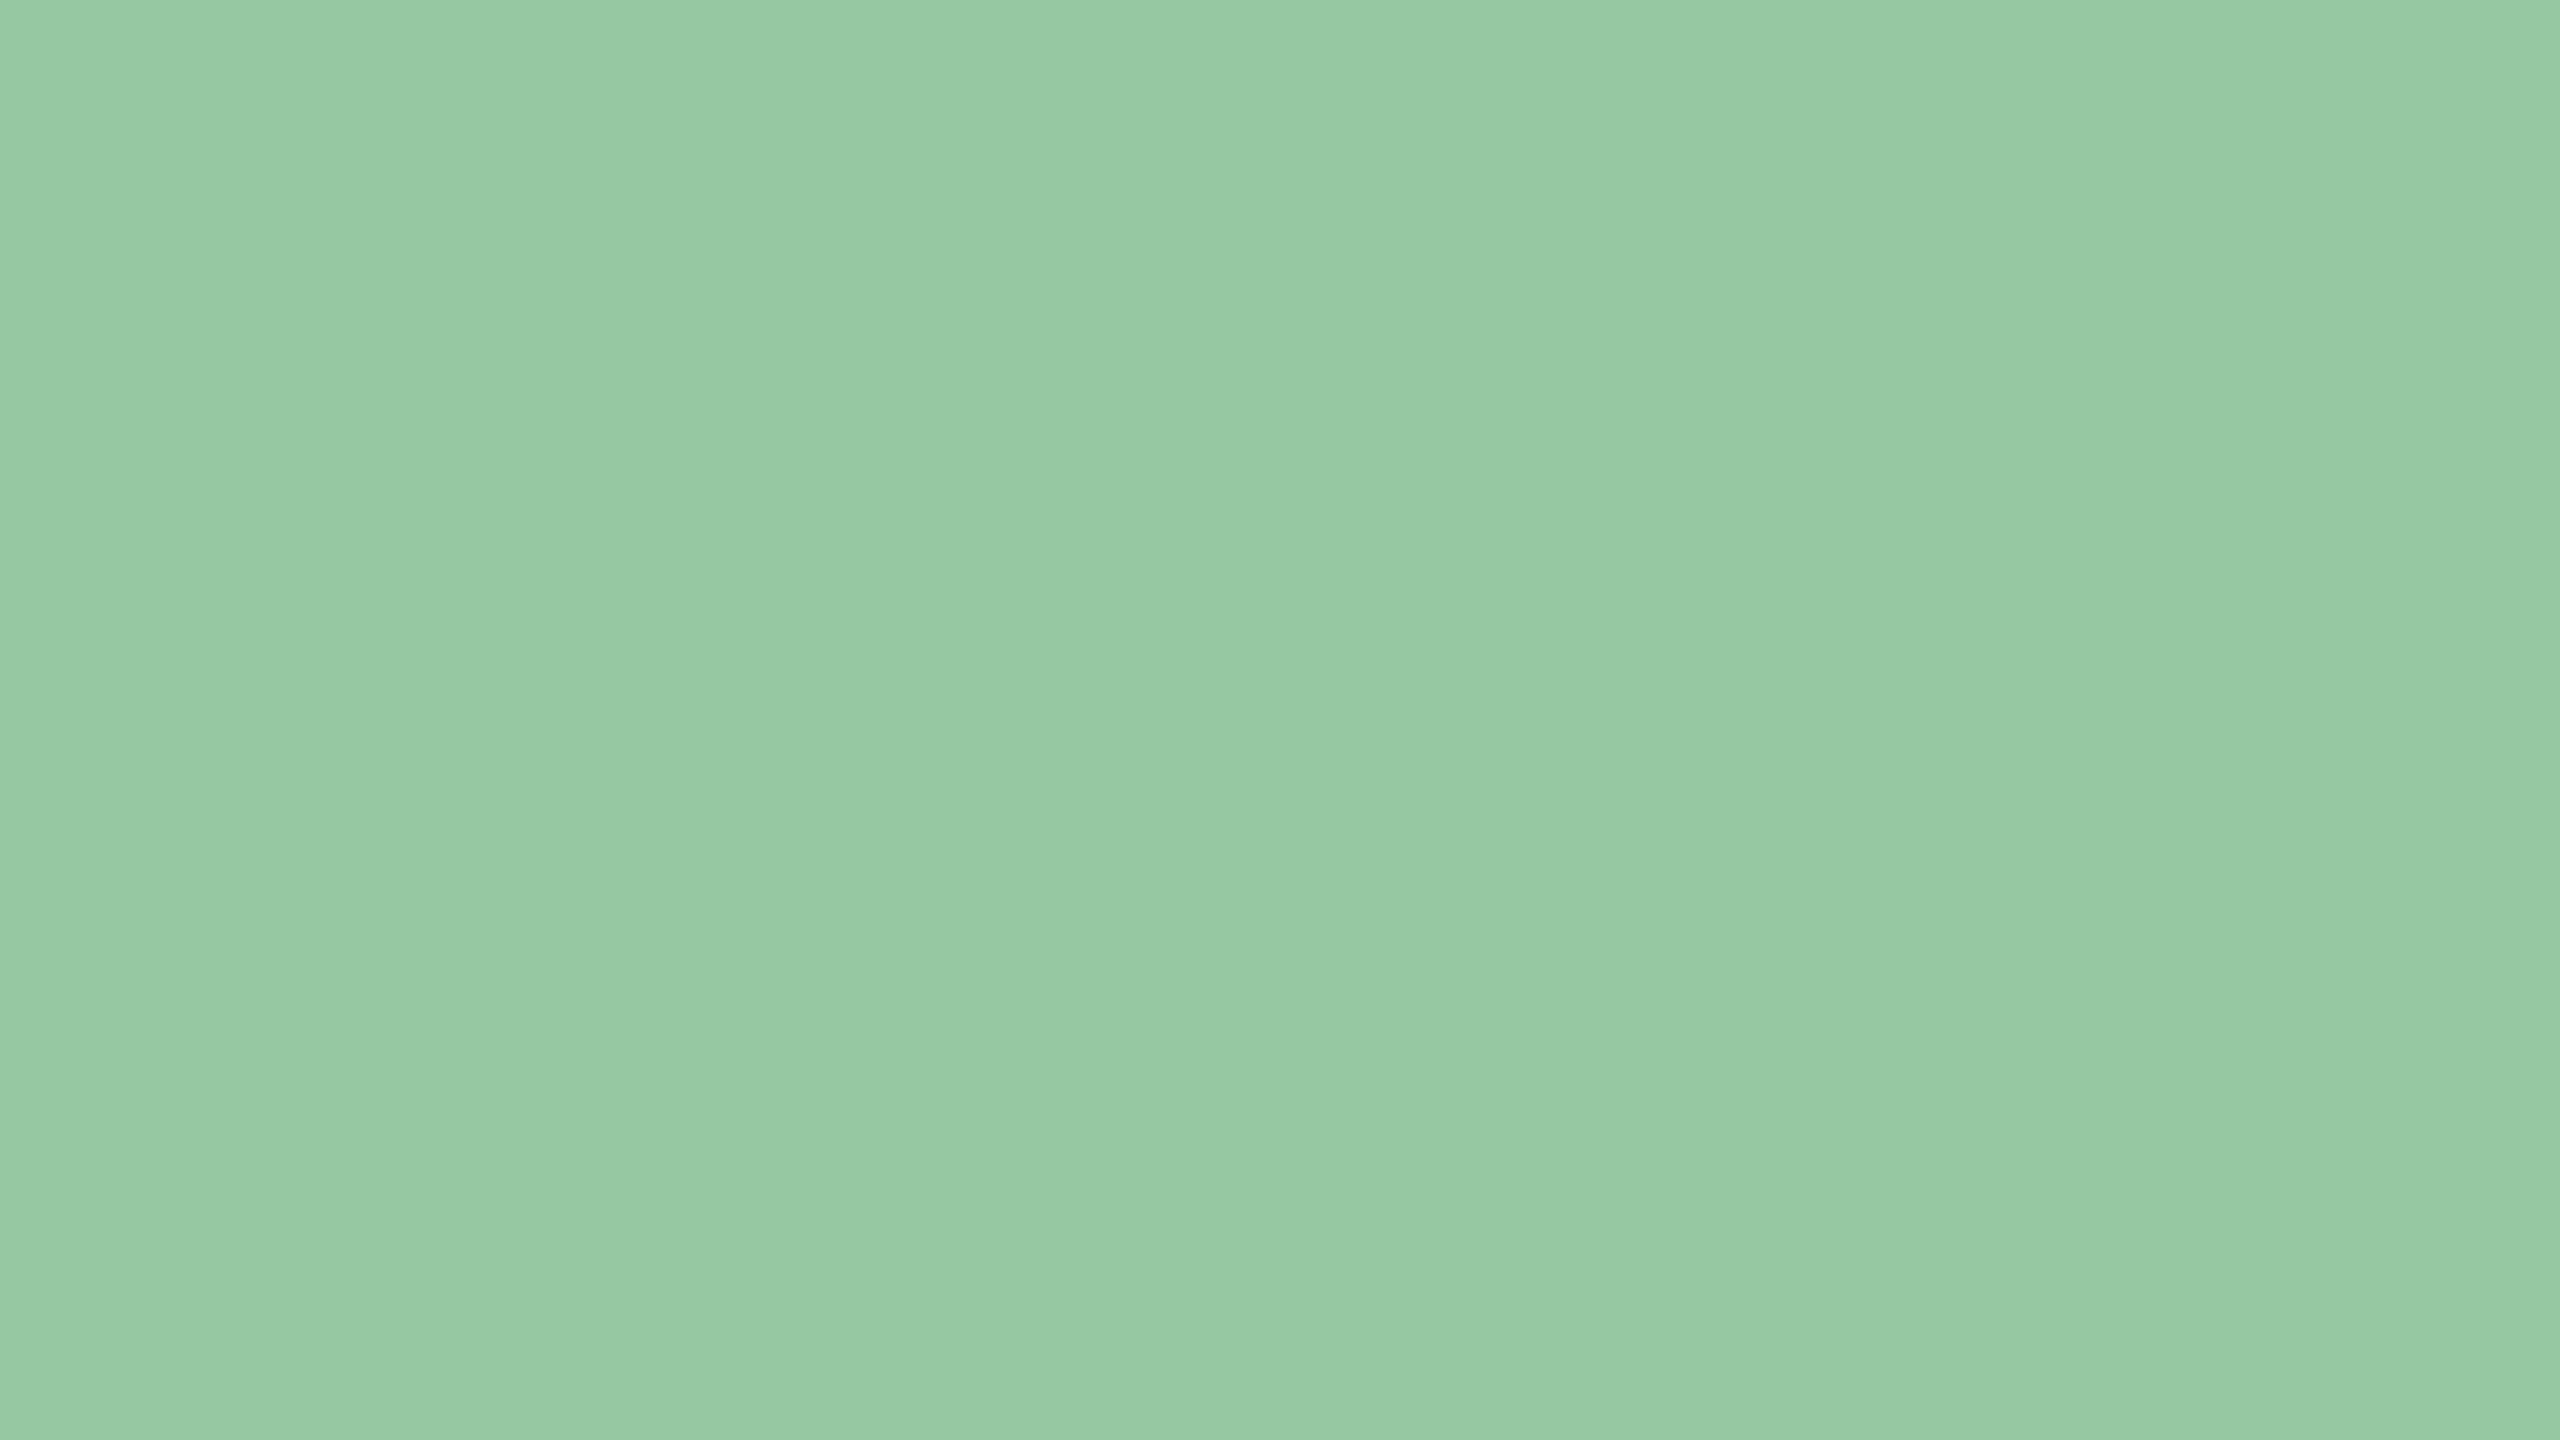 2560x1440 Eton Blue Solid Color Background